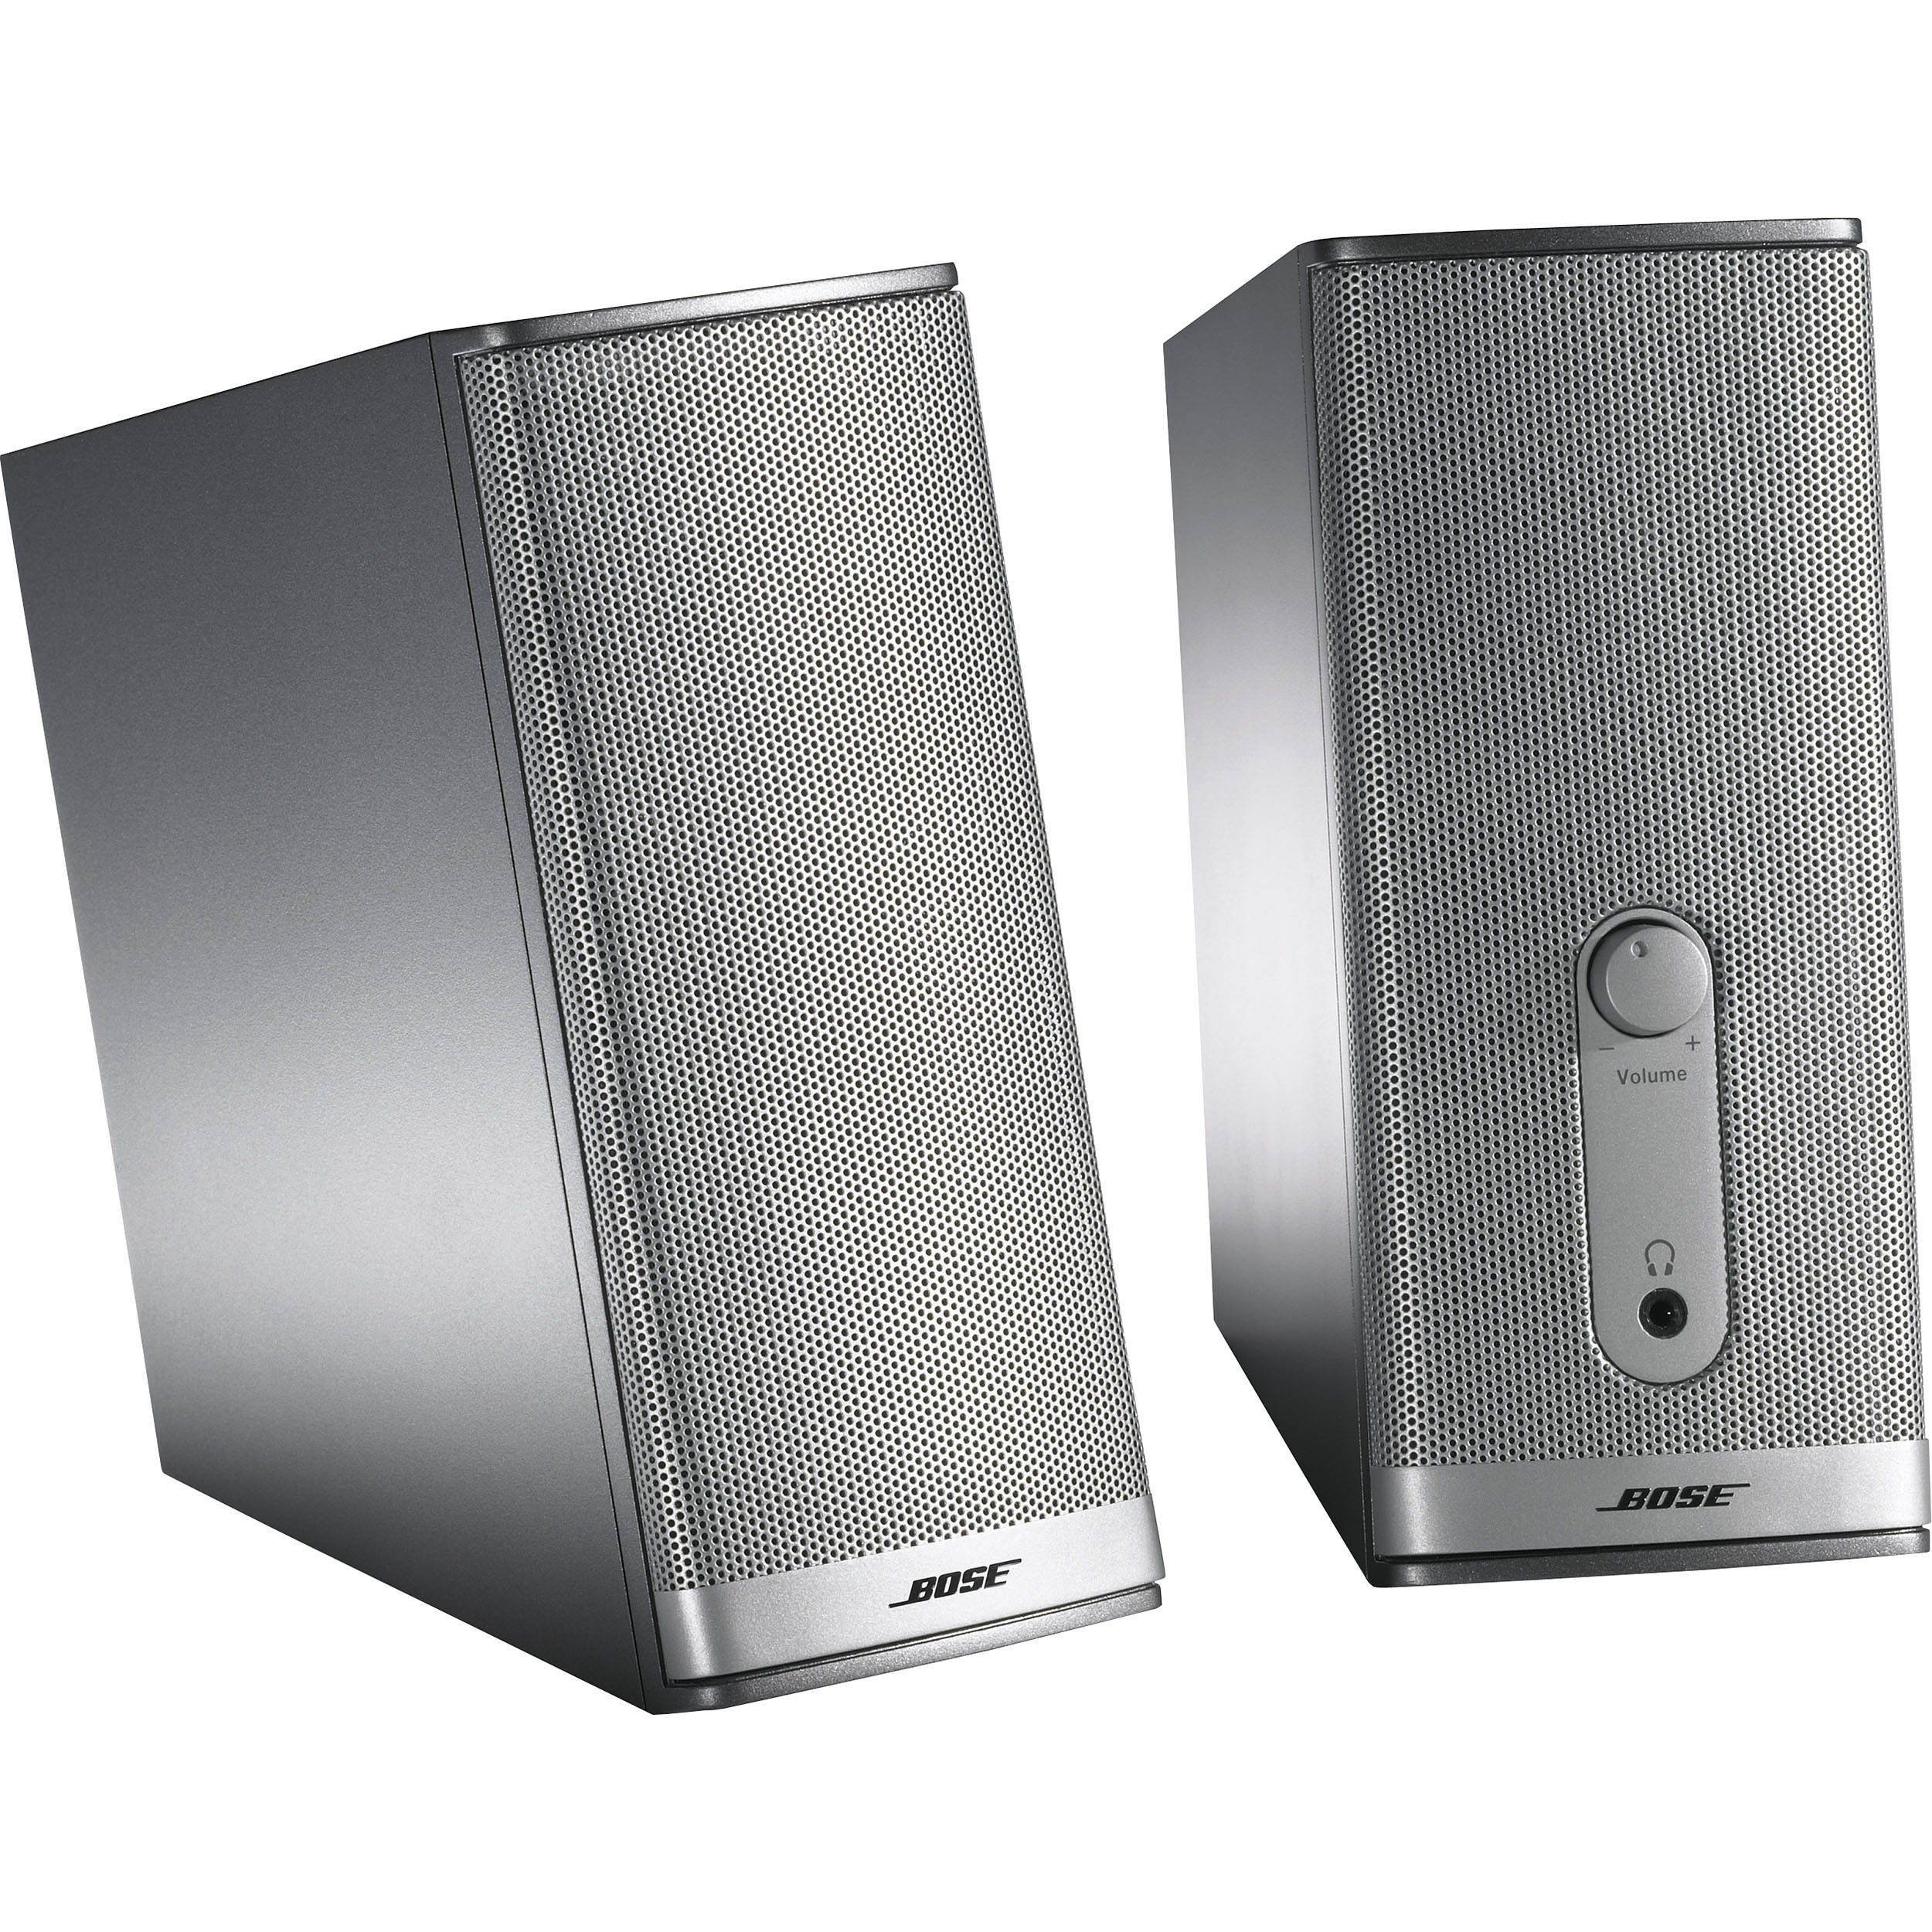 Bose Companion 2 Series 2 Bose Companion 2 Series ii